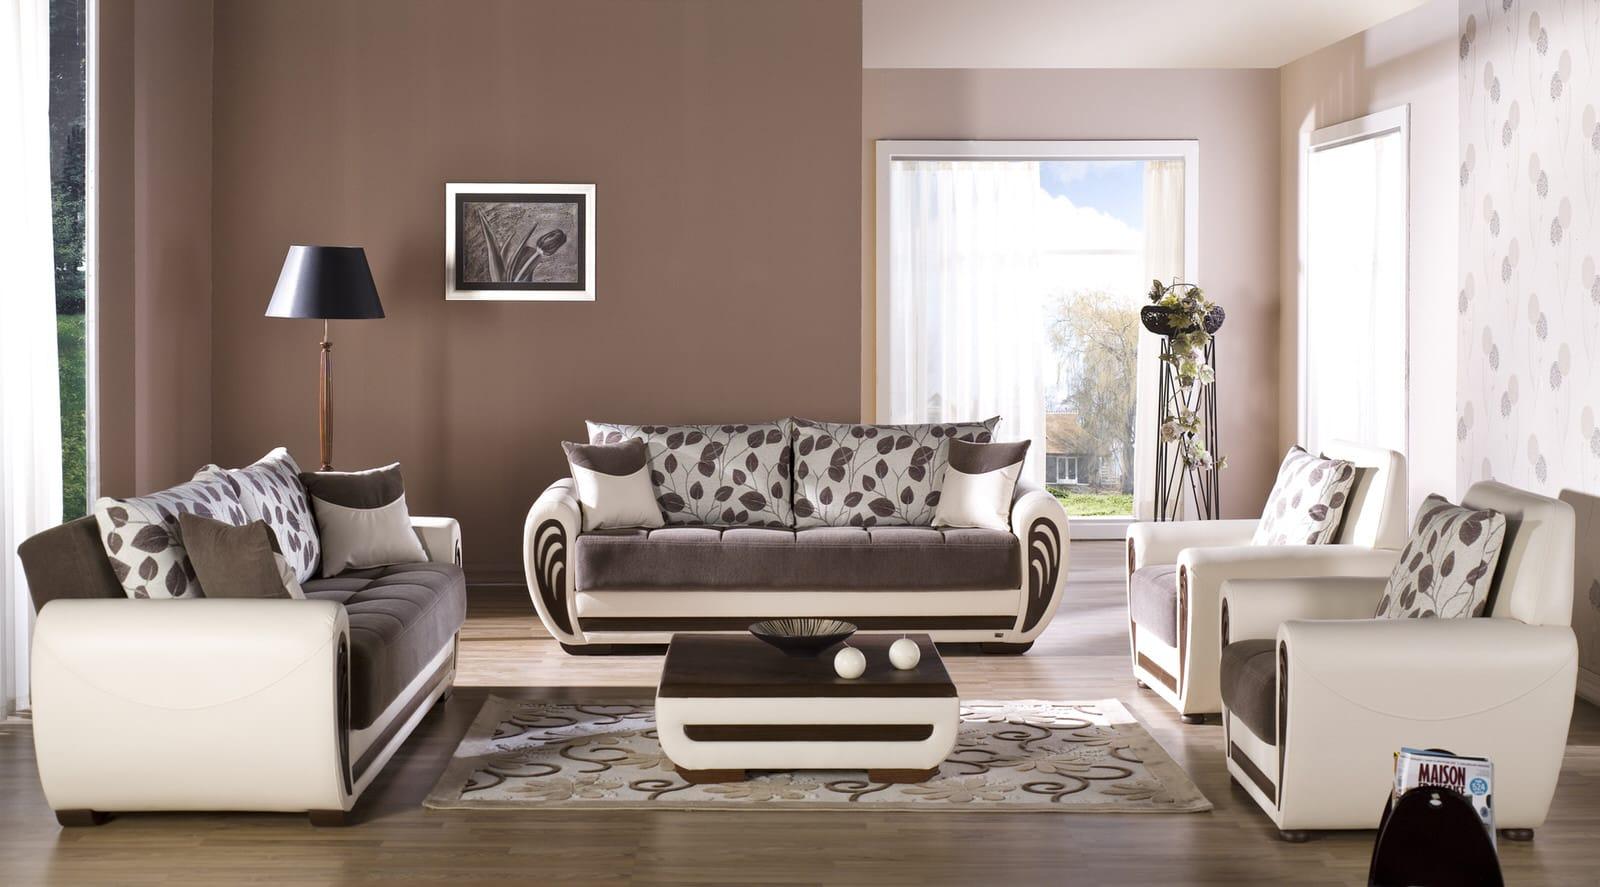 Delightful Marina Armoni Brown Sofa, Love U0026 Chair Set By Istikbal (Sunset) (Istikbal